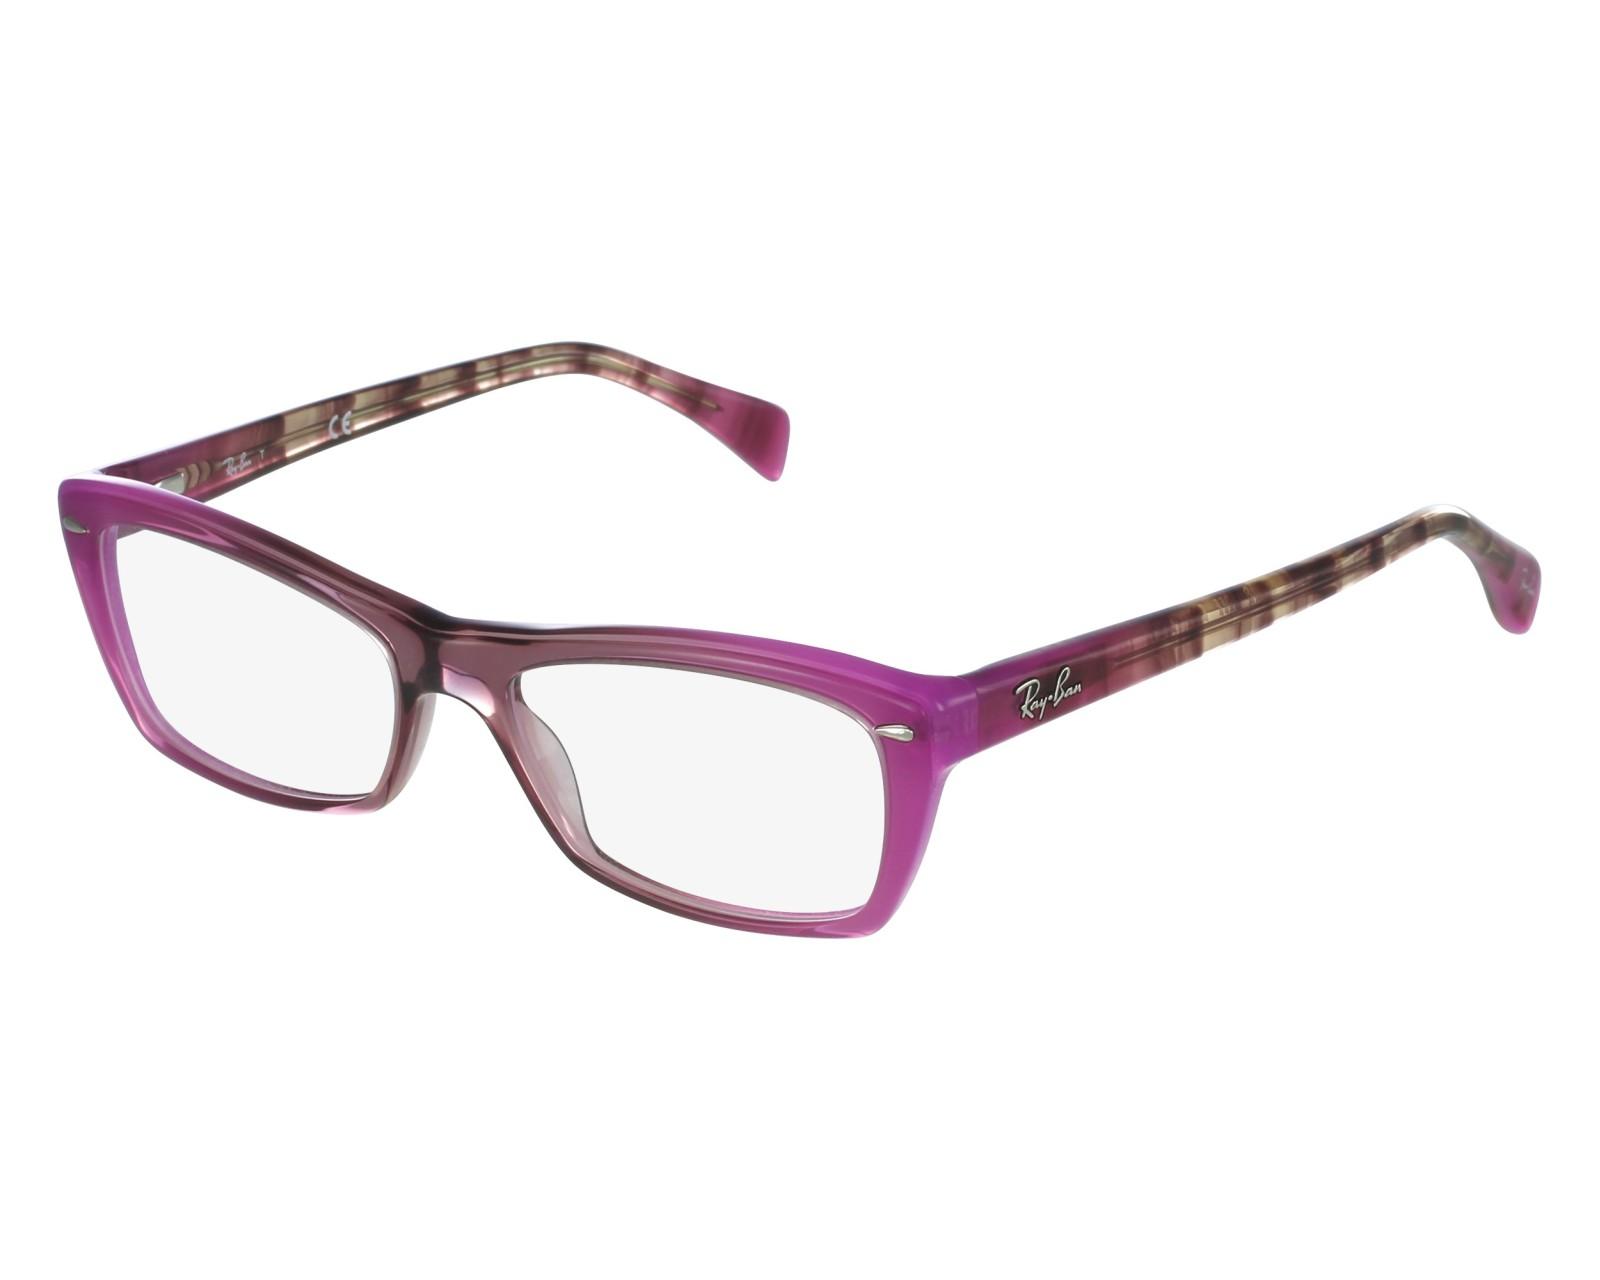 a681cb492a Gafas Graduadas Ray-Ban RX-5255 5489 53-16 Lila Purpura Marrón vista